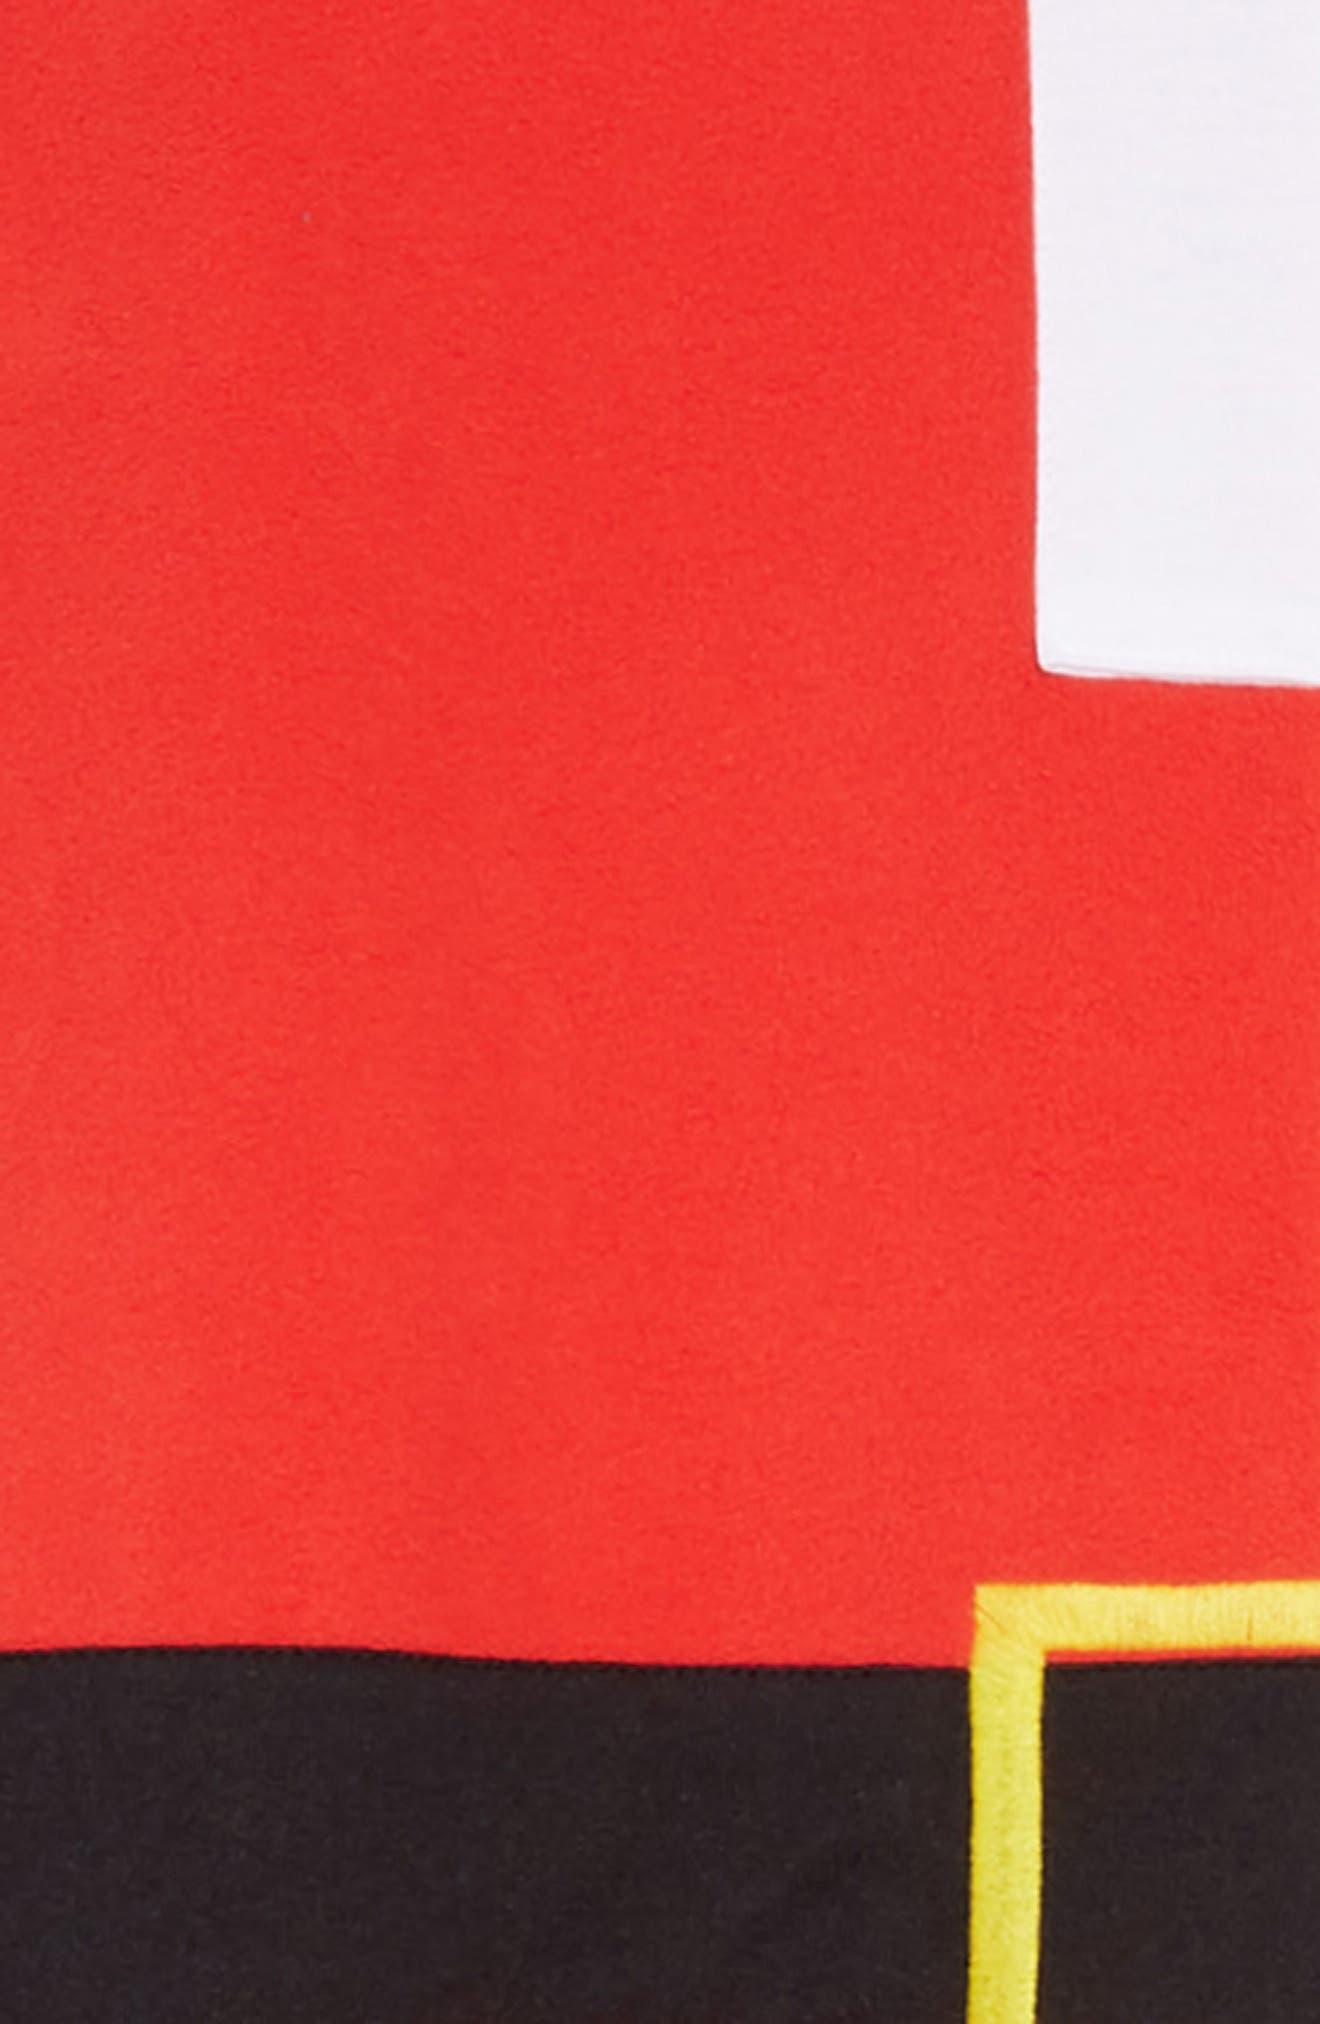 Santa Hooded One-Piece Pajamas,                             Alternate thumbnail 2, color,                             RED BLOOM SANTA SUIT